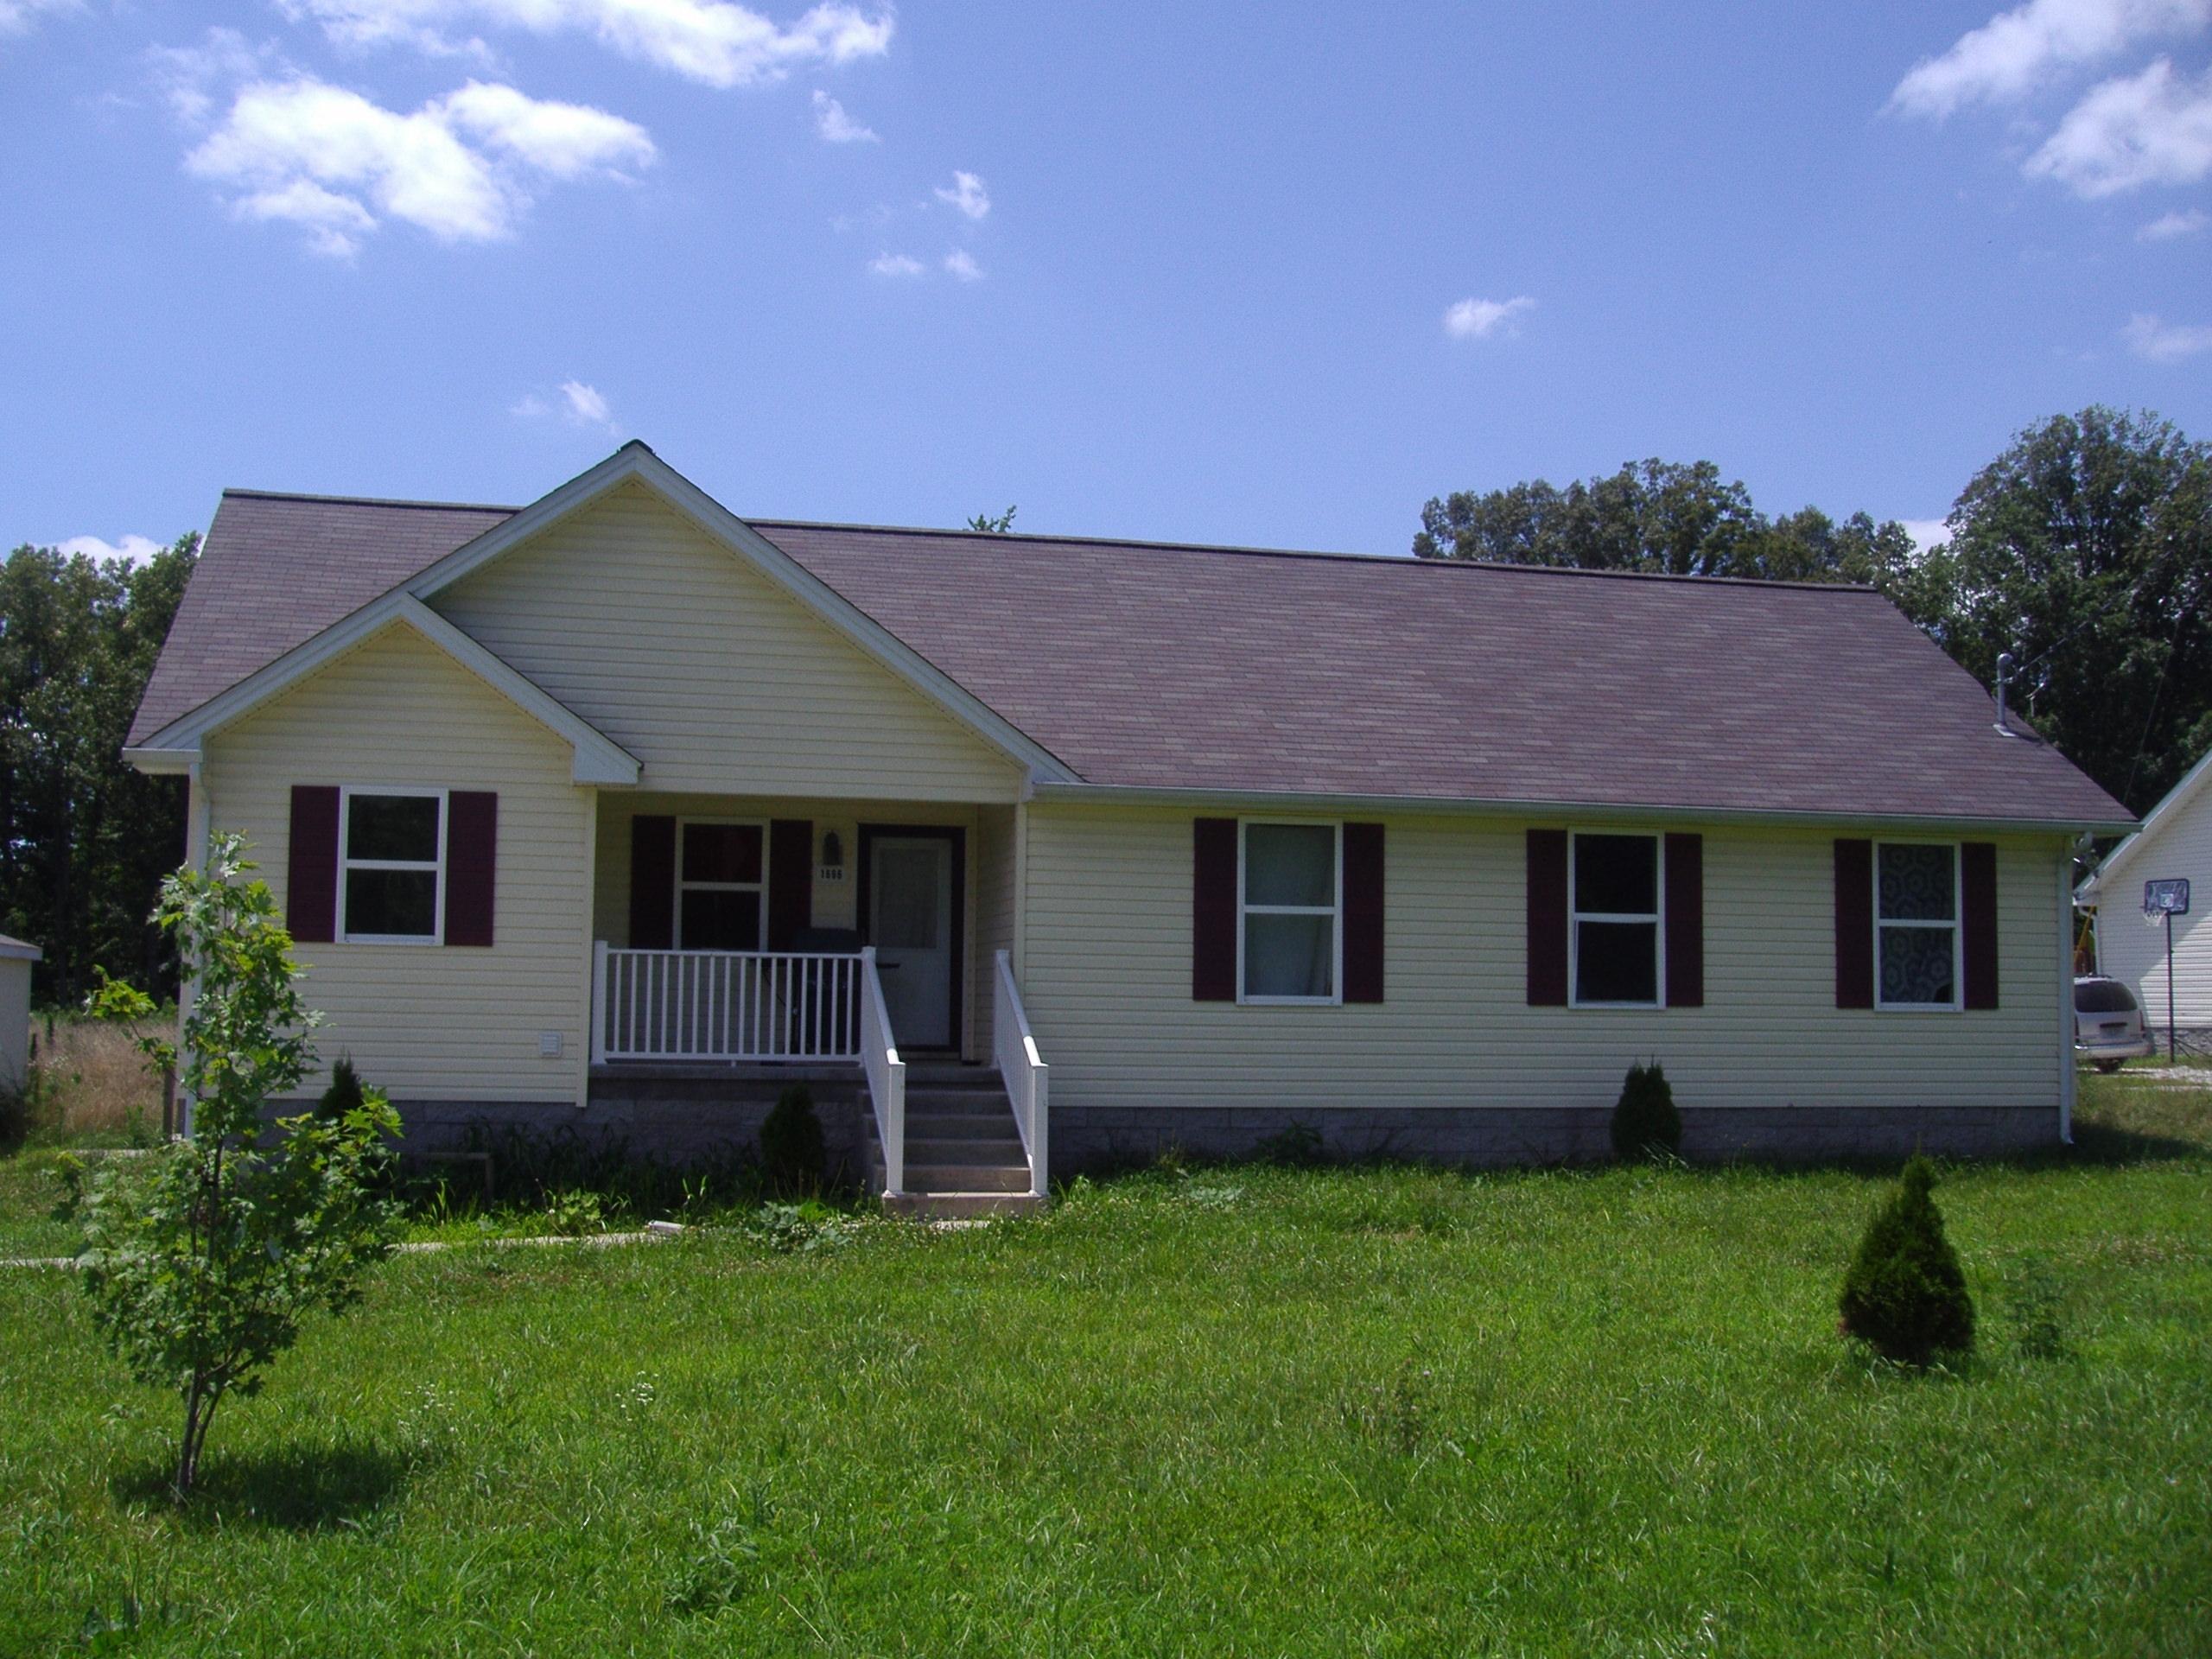 1696 Vanlandingham Rd, Salt Lick KY, KY 40371